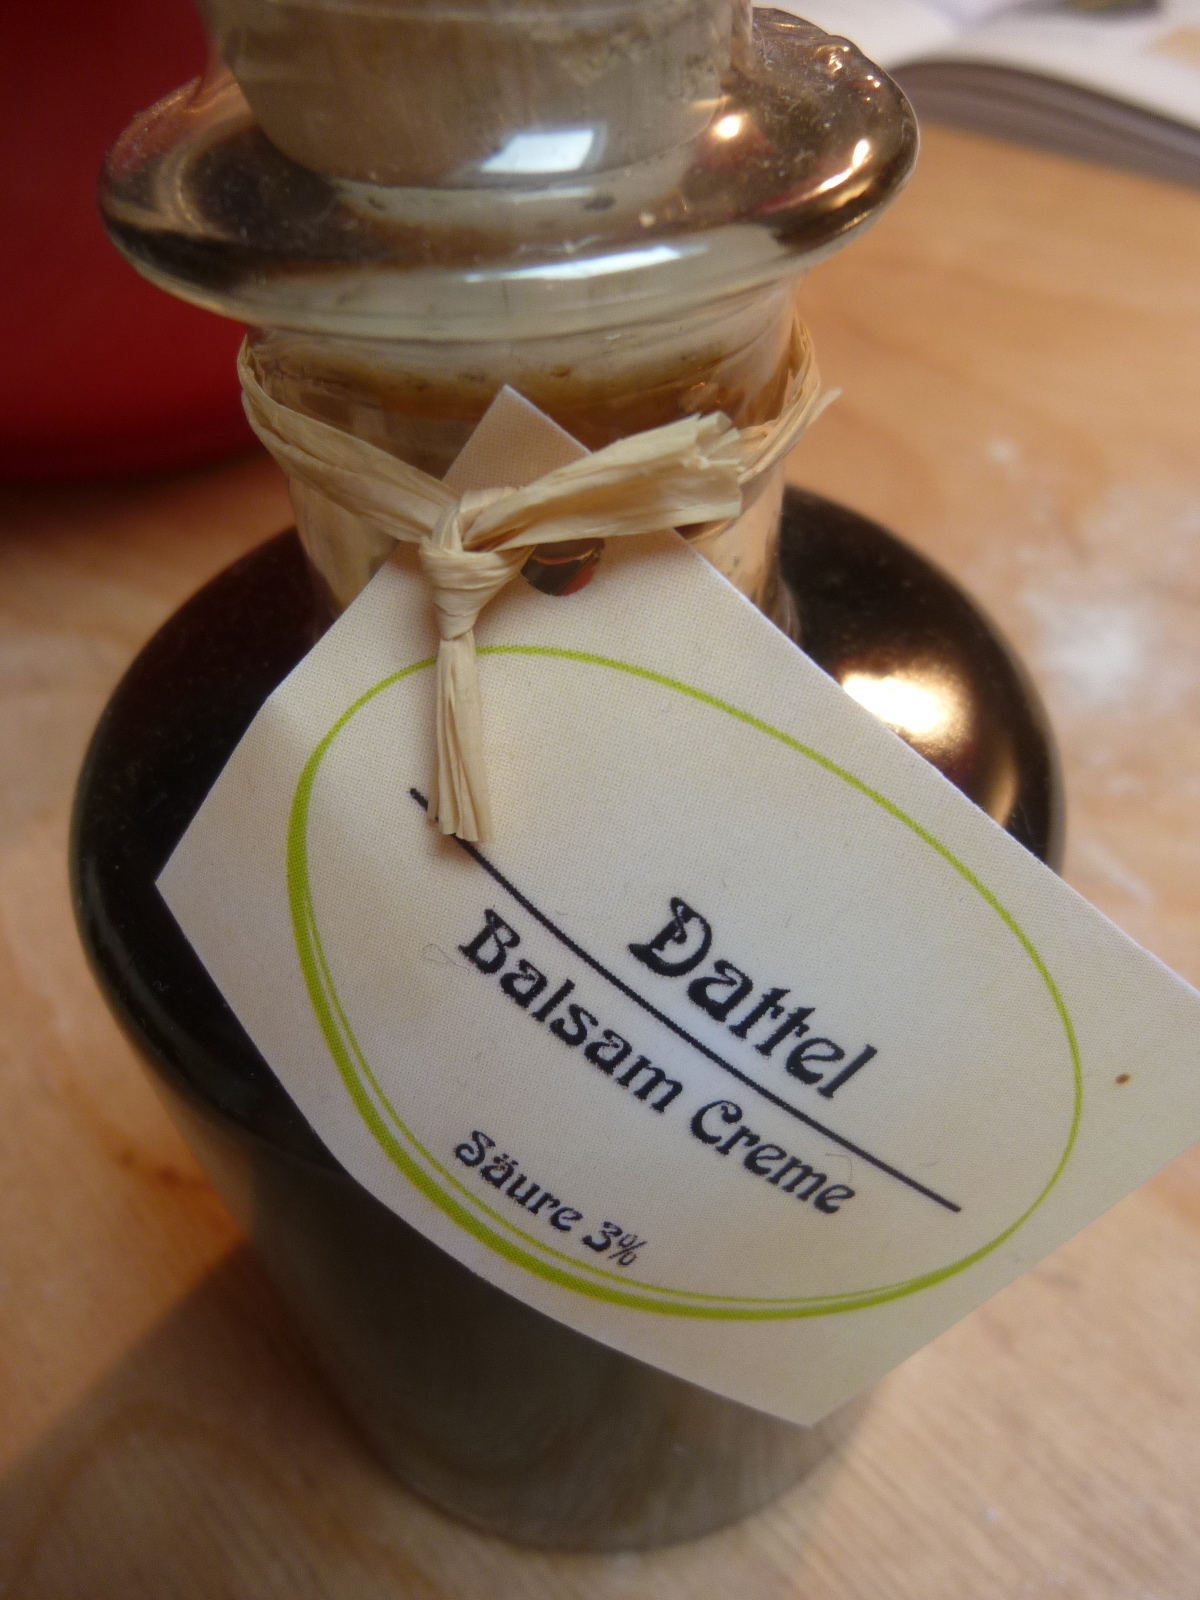 Cinnamon Macarons With Date Balsamic Vinegar Mascarpone